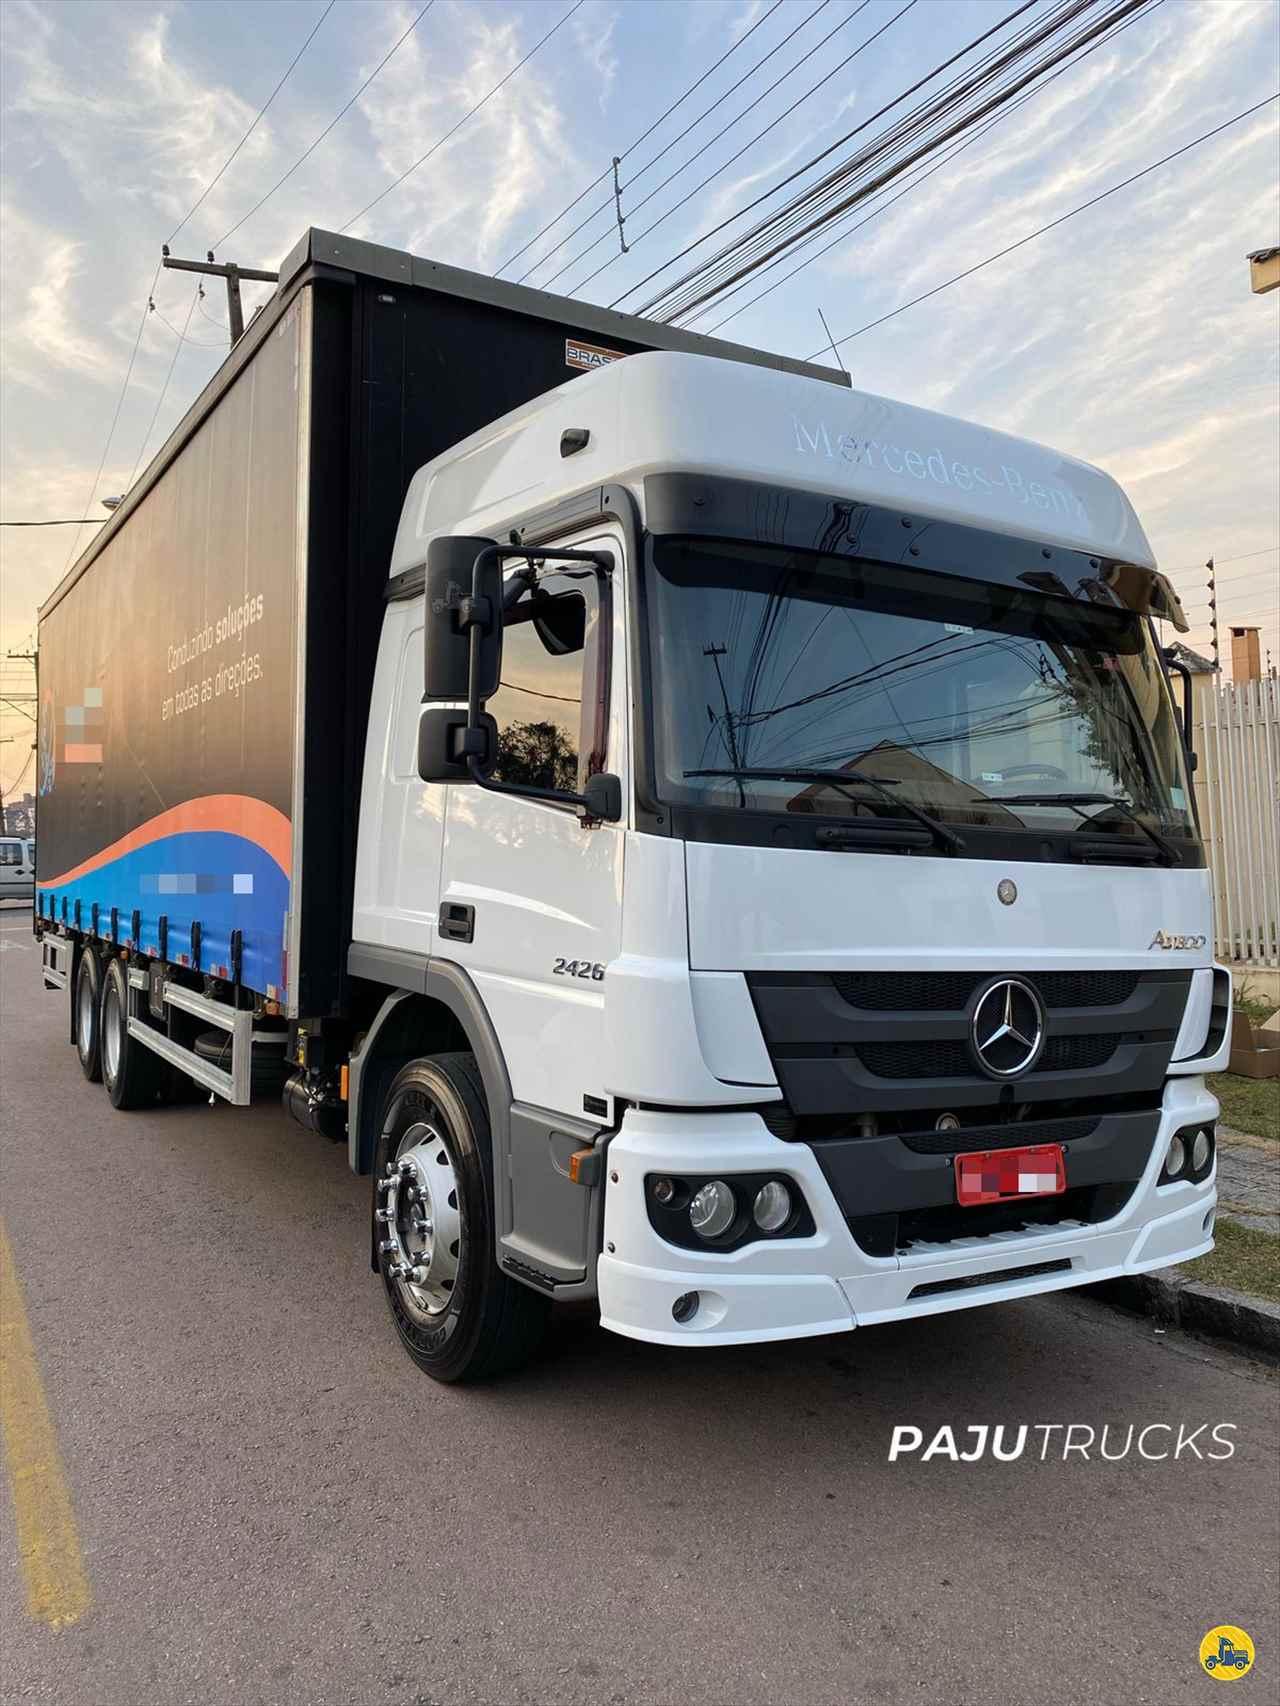 CAMINHAO MERCEDES-BENZ MB 2426 Baú Sider Truck 6x2 Paju Trucks CURITIBA PARANÁ PR